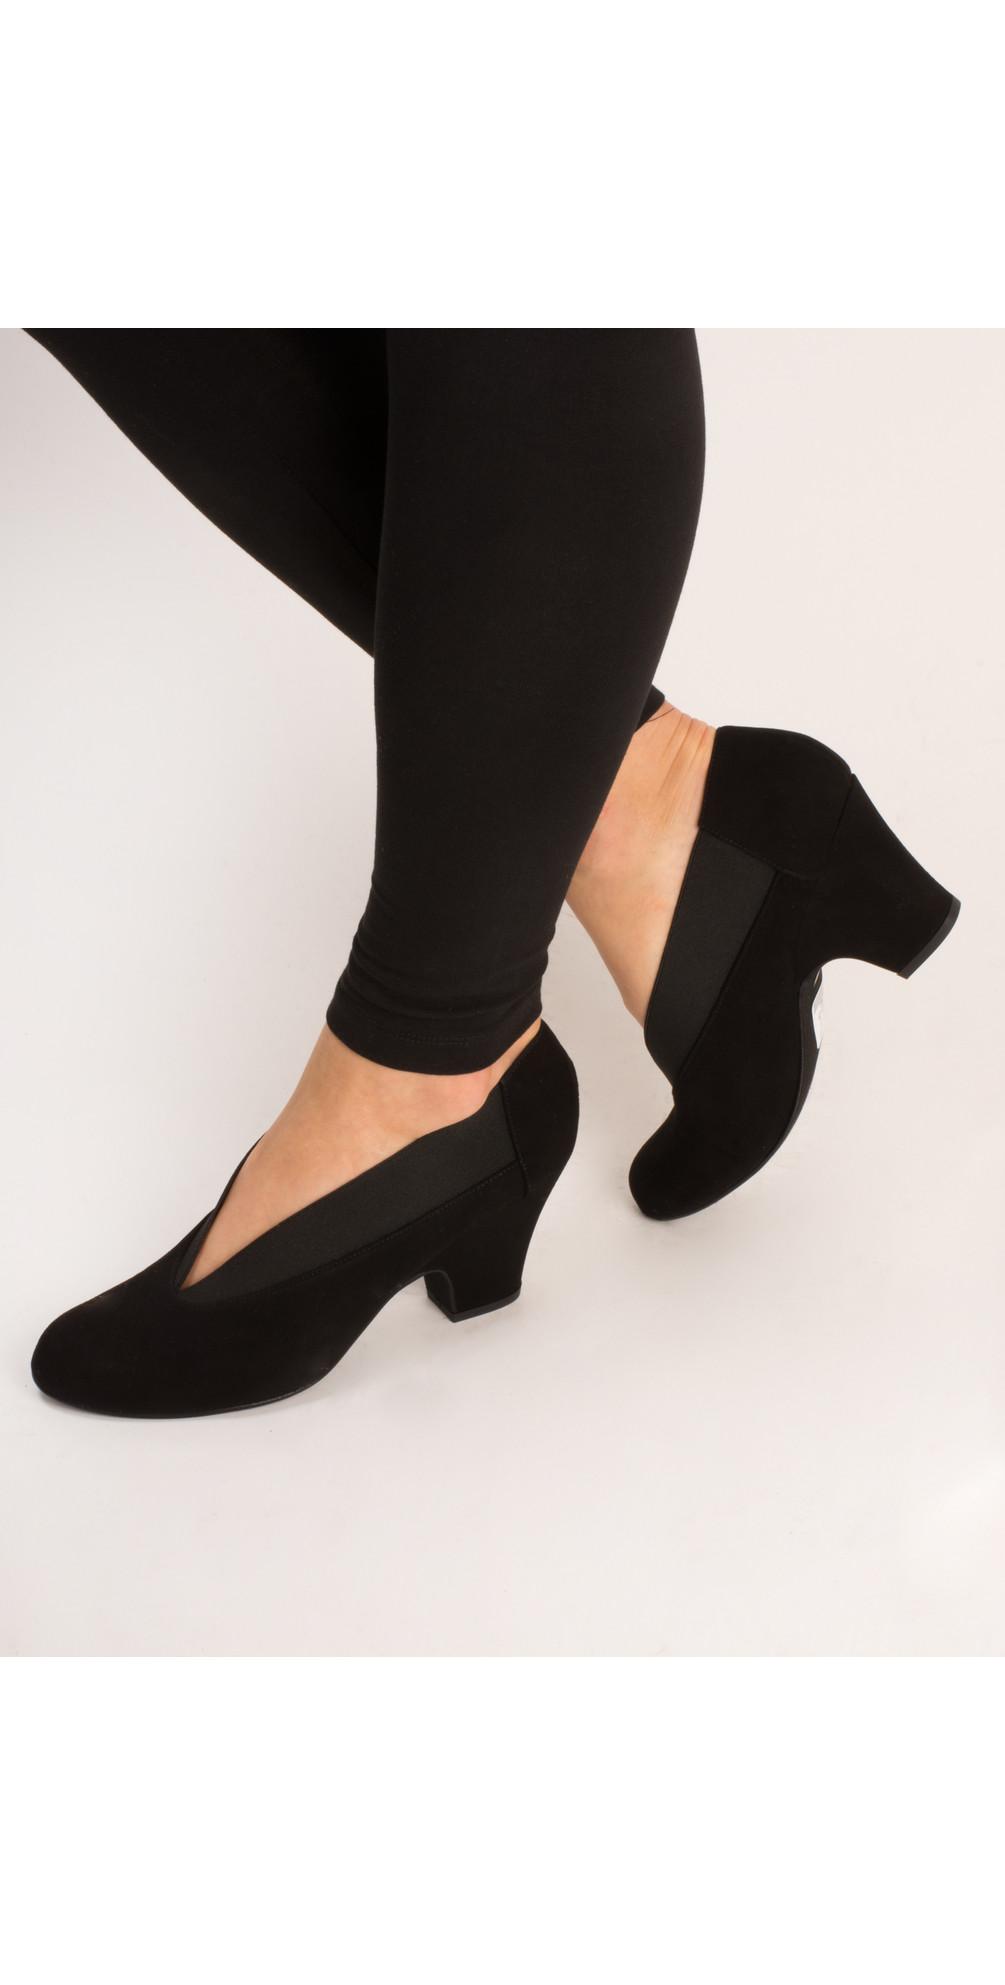 Brumabe Black Suede Shoe main image